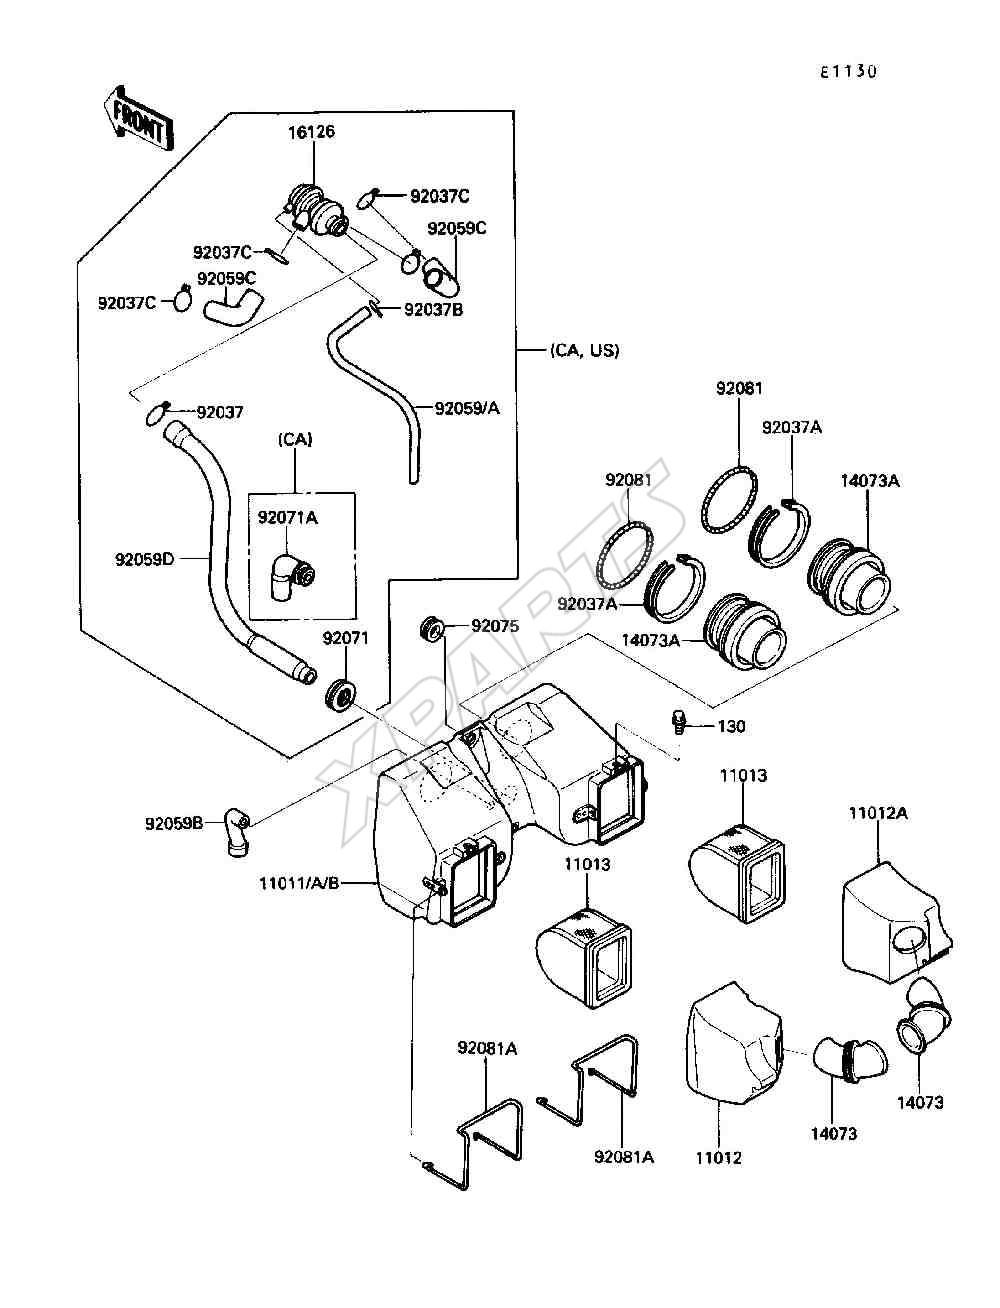 hight resolution of kawasaki motorcycle wiring diagrams kawasaki billede til varegruppe air cleaner